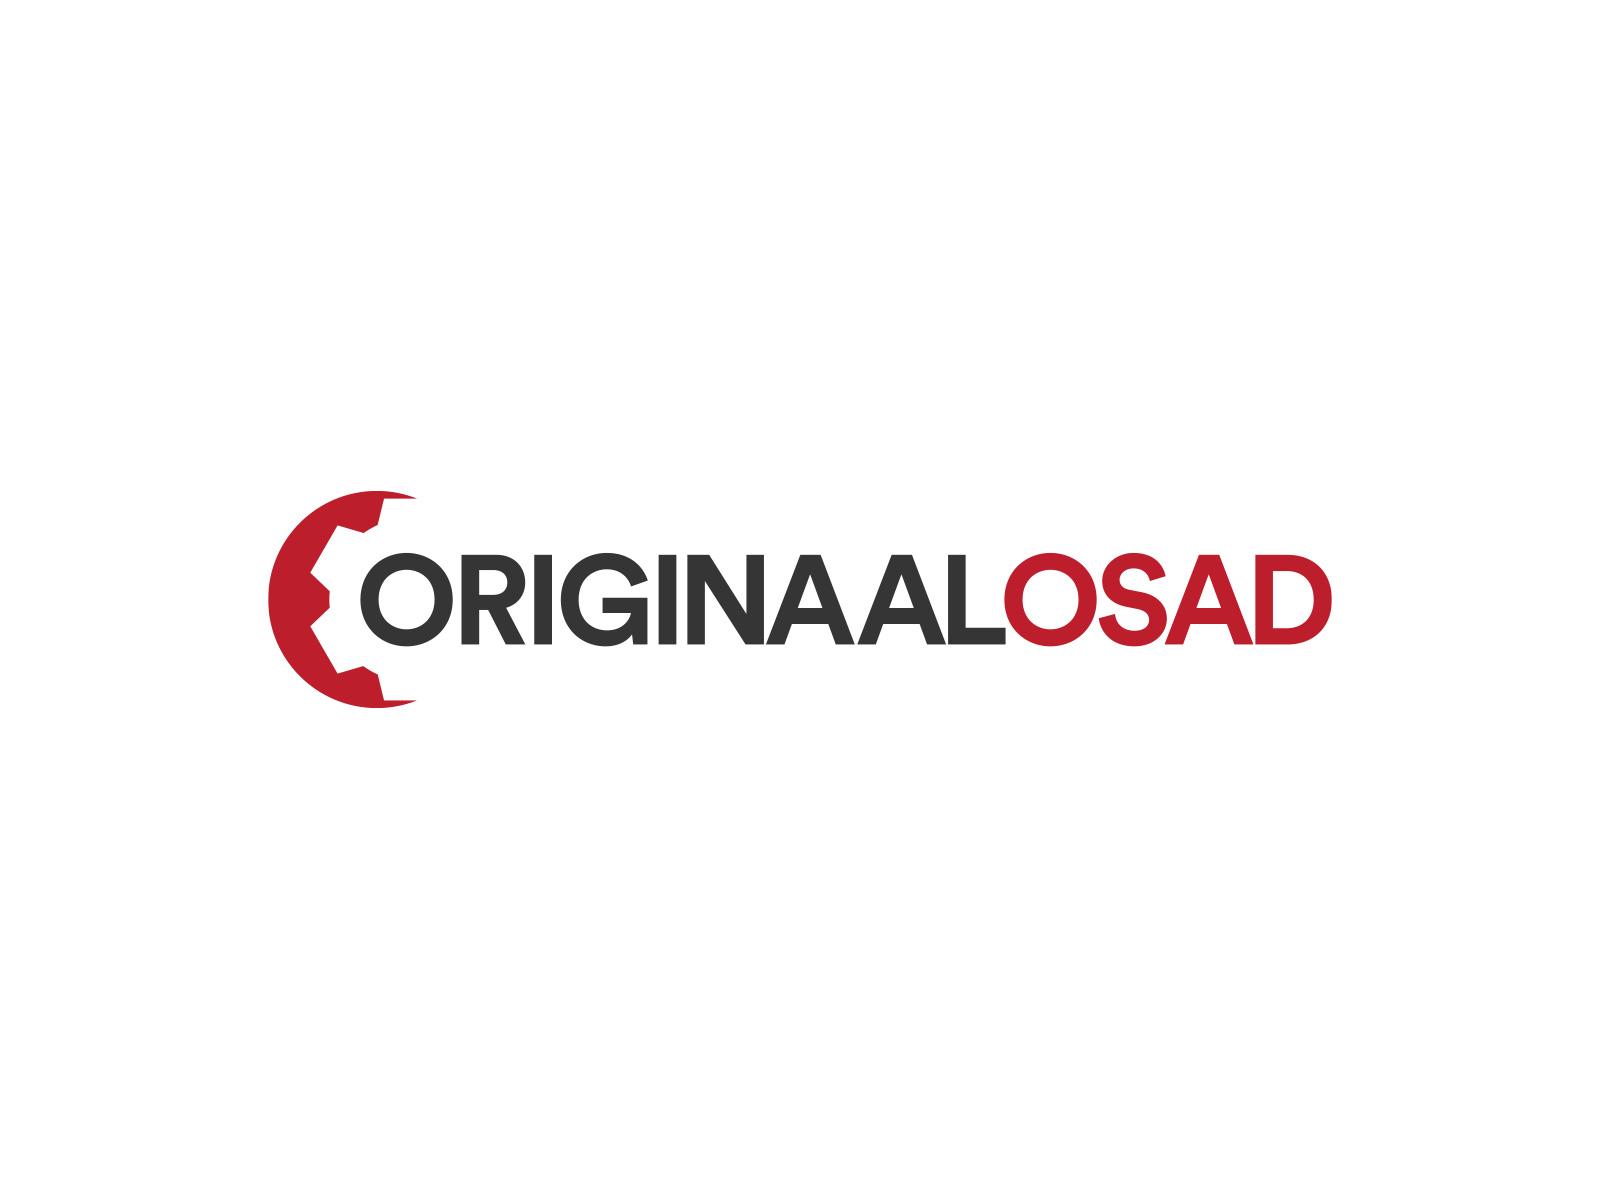 originalosad logotype